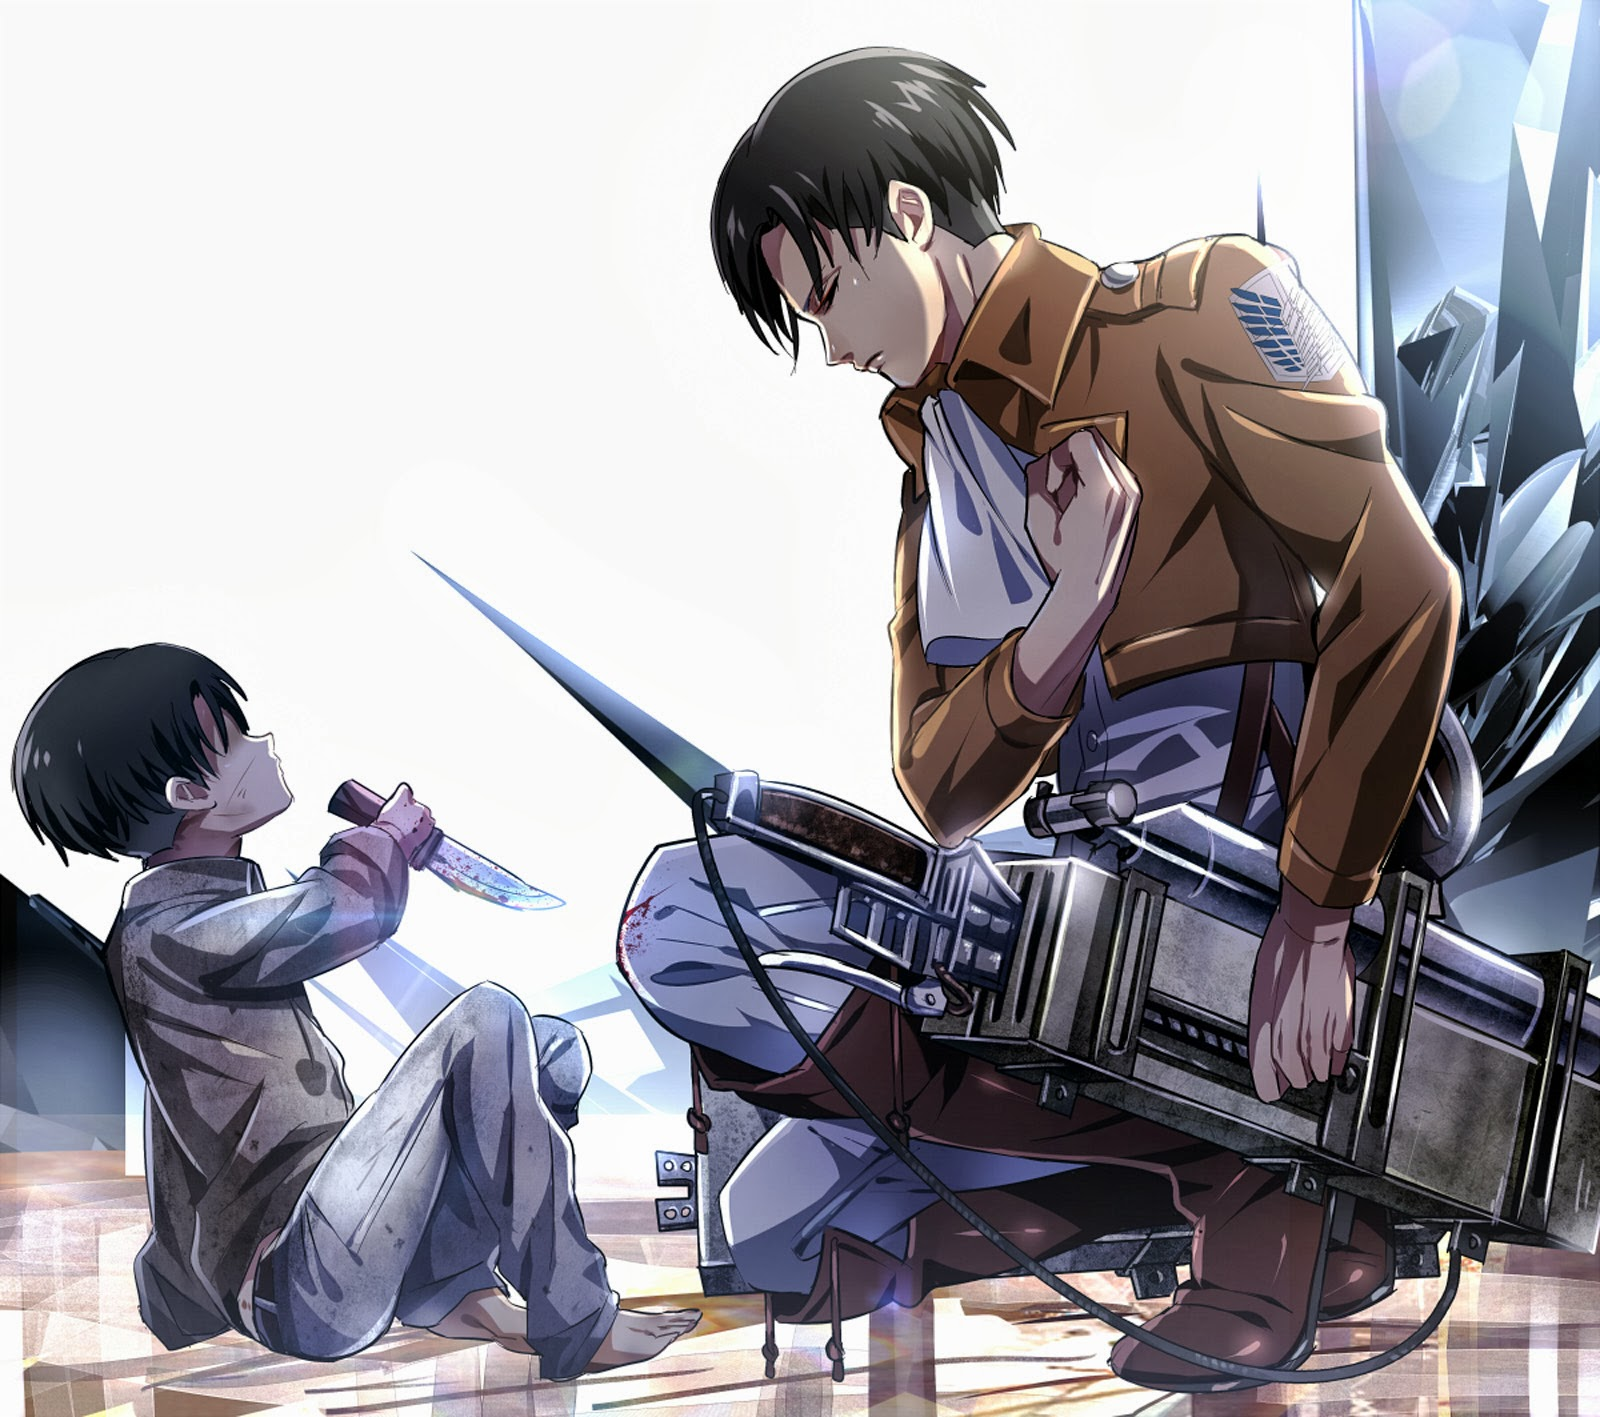 Levi Rivaille Attack on Titan Shingeki no Kyojin 3D Maneuver Gear Male 1600x1417